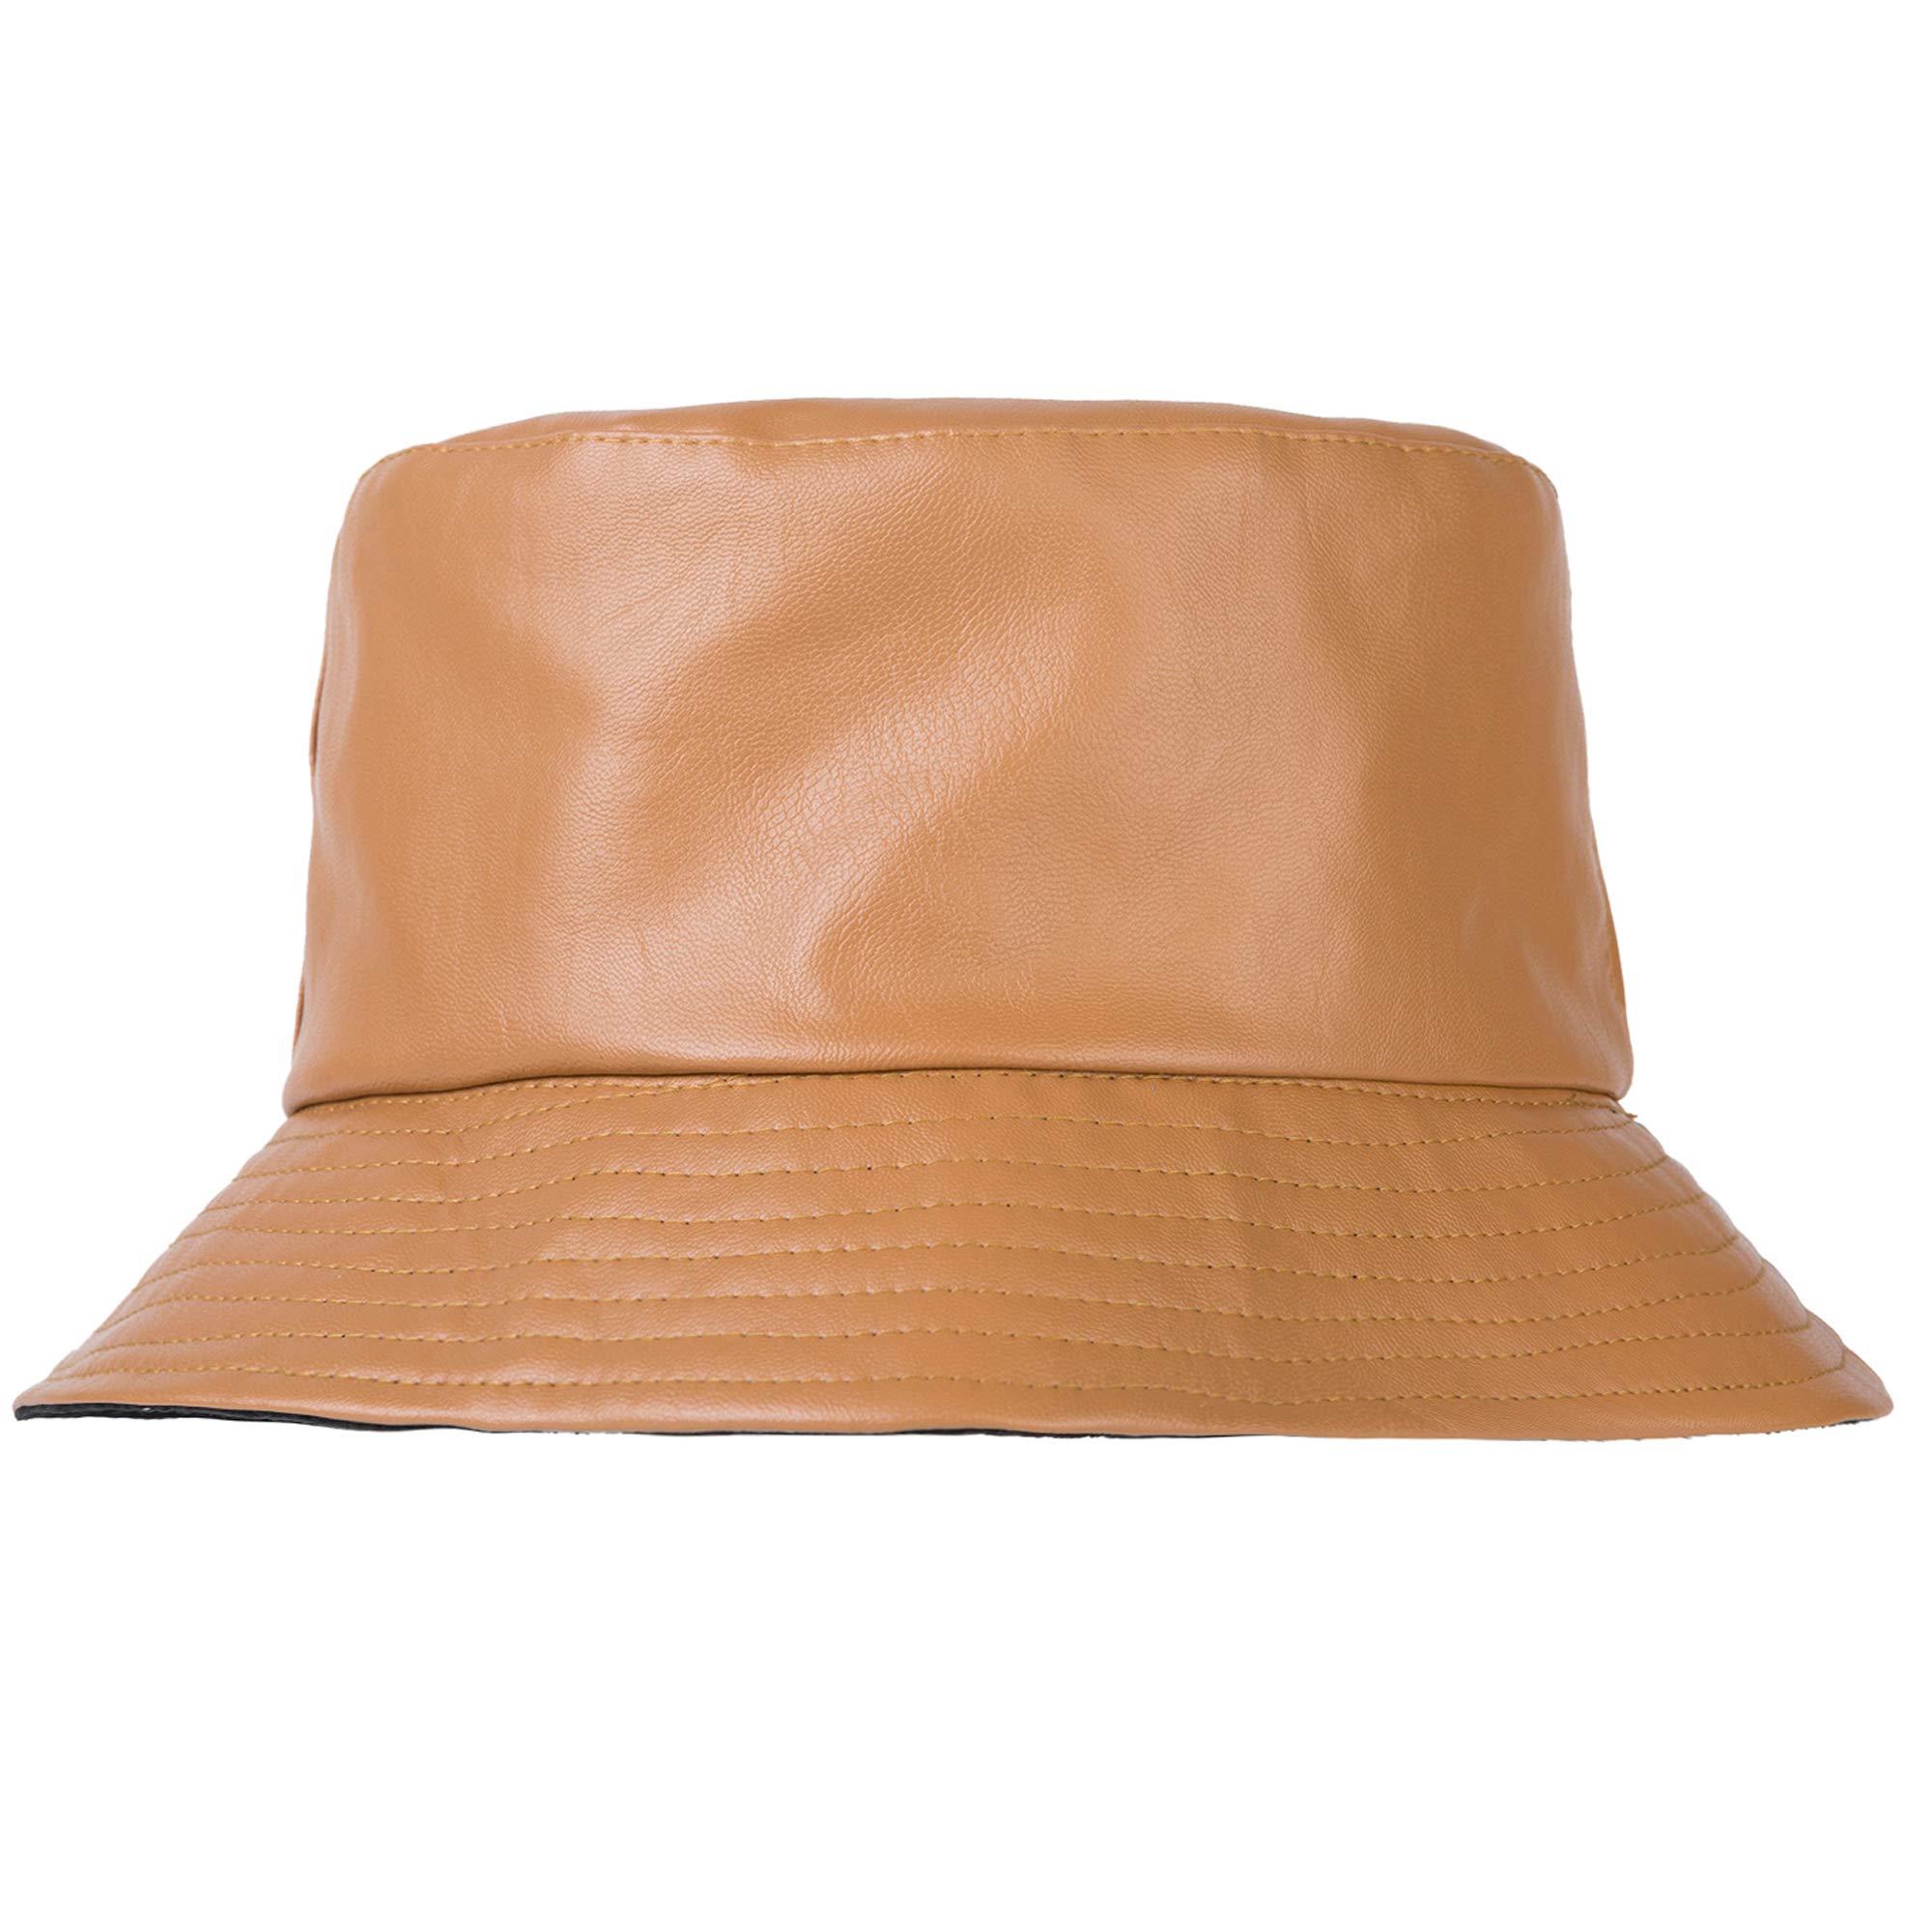 ZLYC Unisex Fashion Bucket Hat PU Leather Rain Hat Waterproof (Orange) by ZLYC